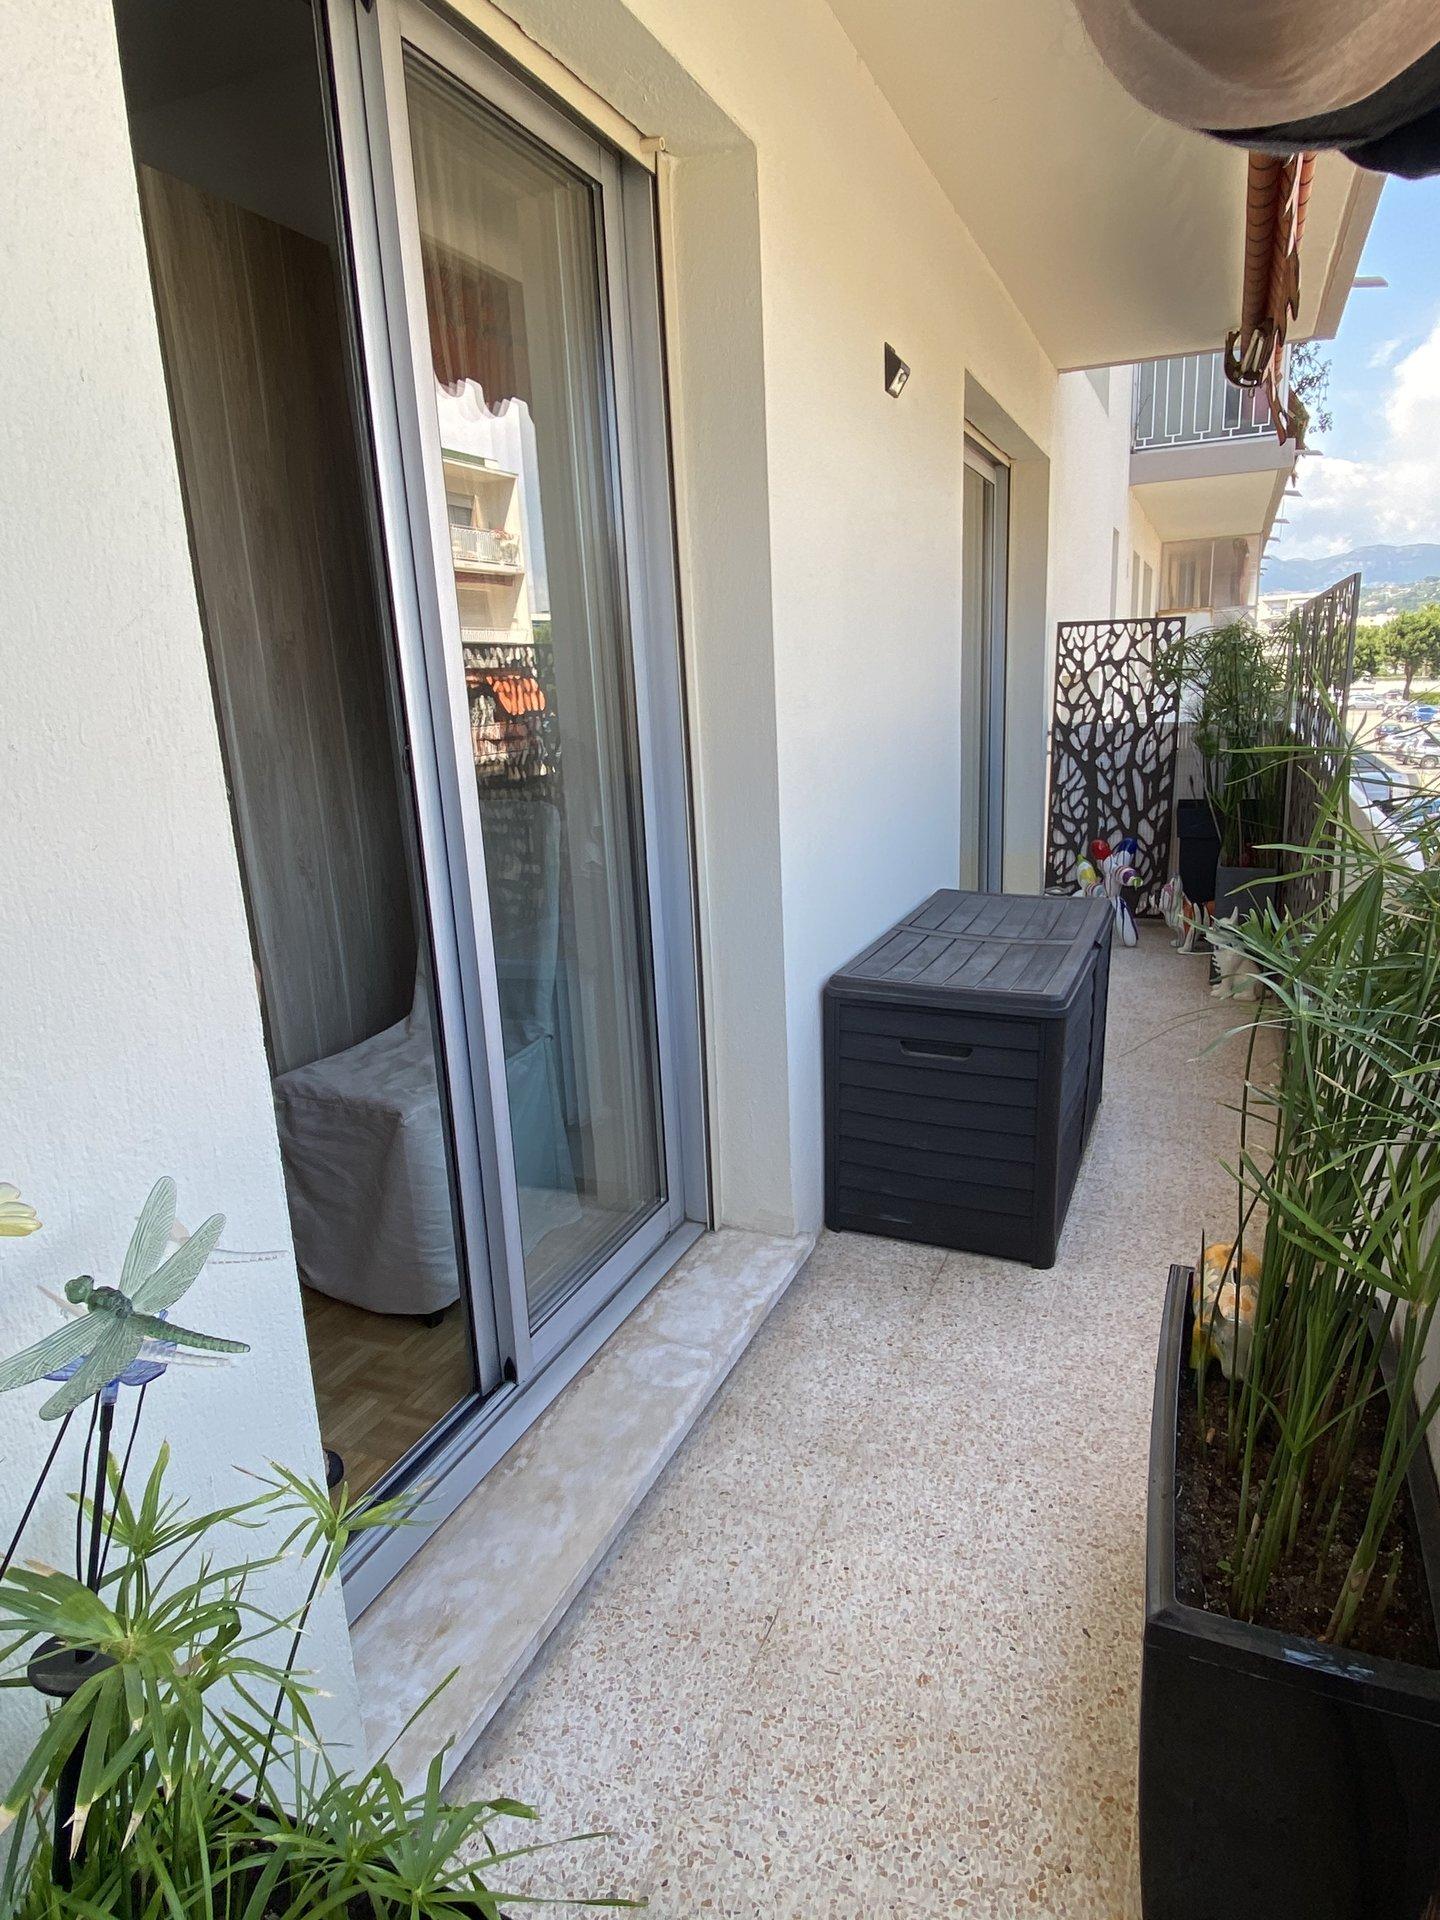 2 rooms for sale, Cagnes-sur-mer, Center